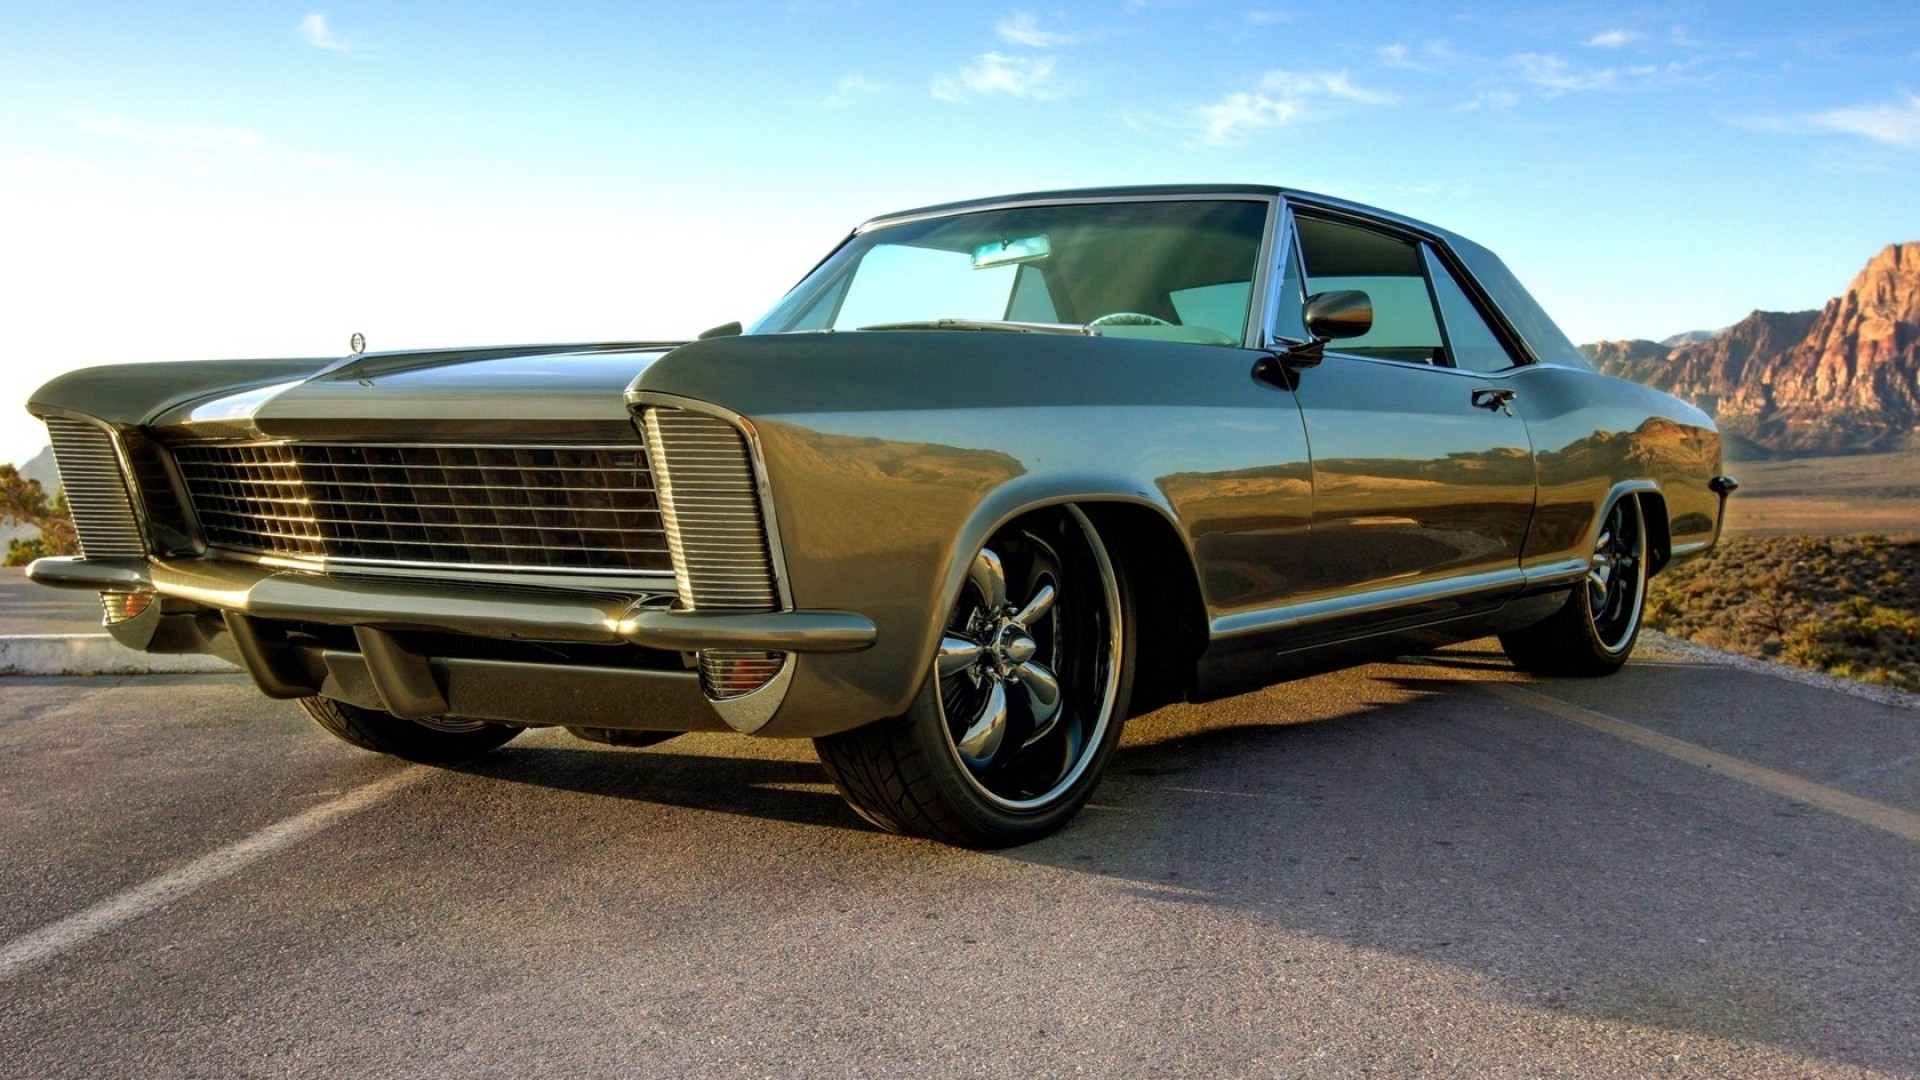 Fine American Cars For Sale Usa Photos - Classic Cars Ideas - boiq.info